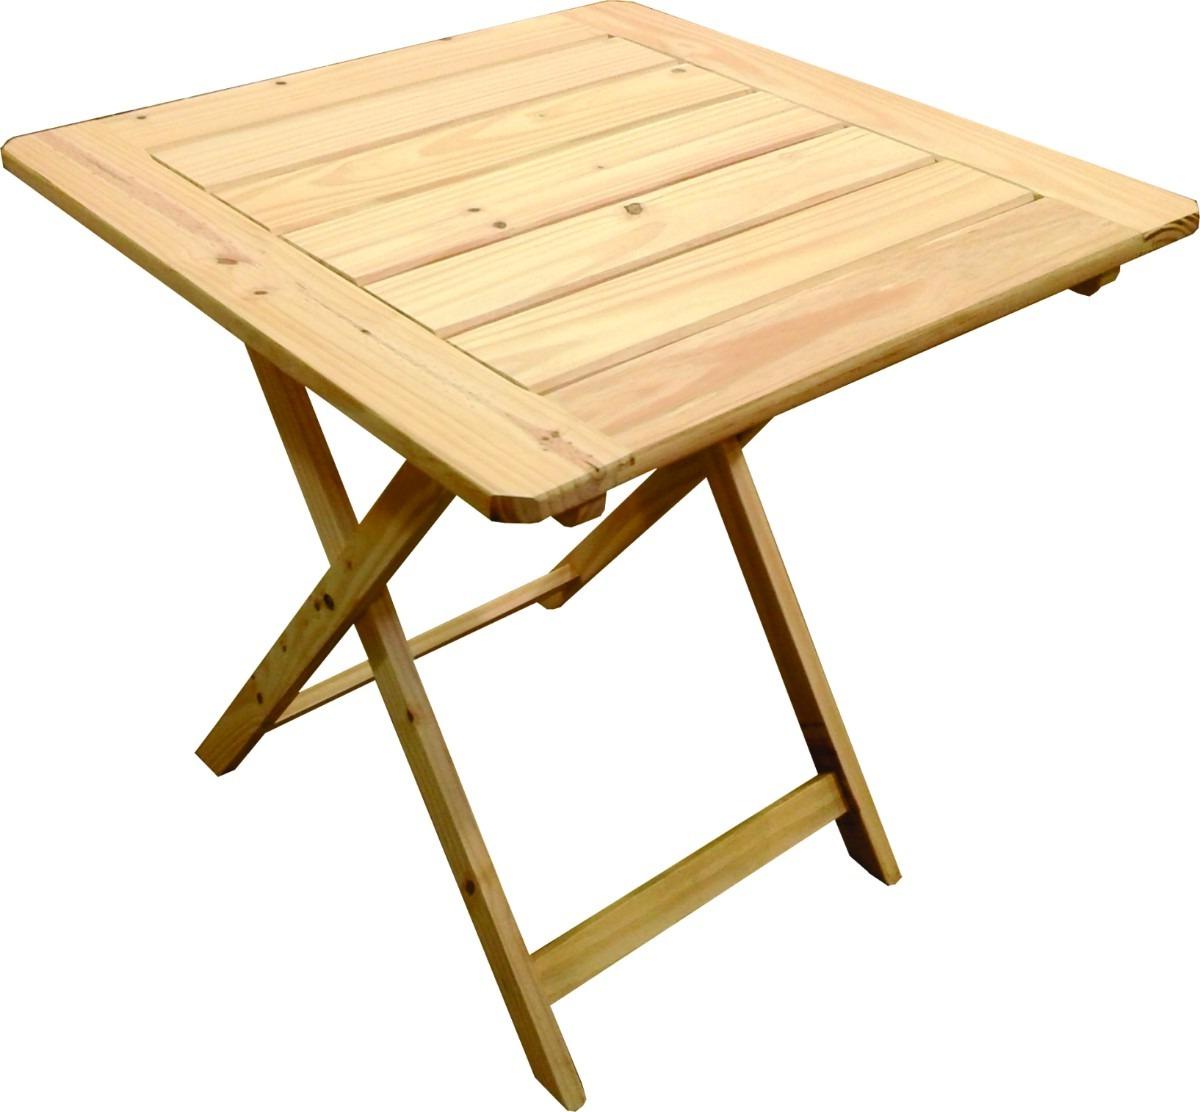 Mesa Madera Plegable Dddy Mesa Plegable De Madera 75×75 Bar Patio Jardin Terraza Sum 890